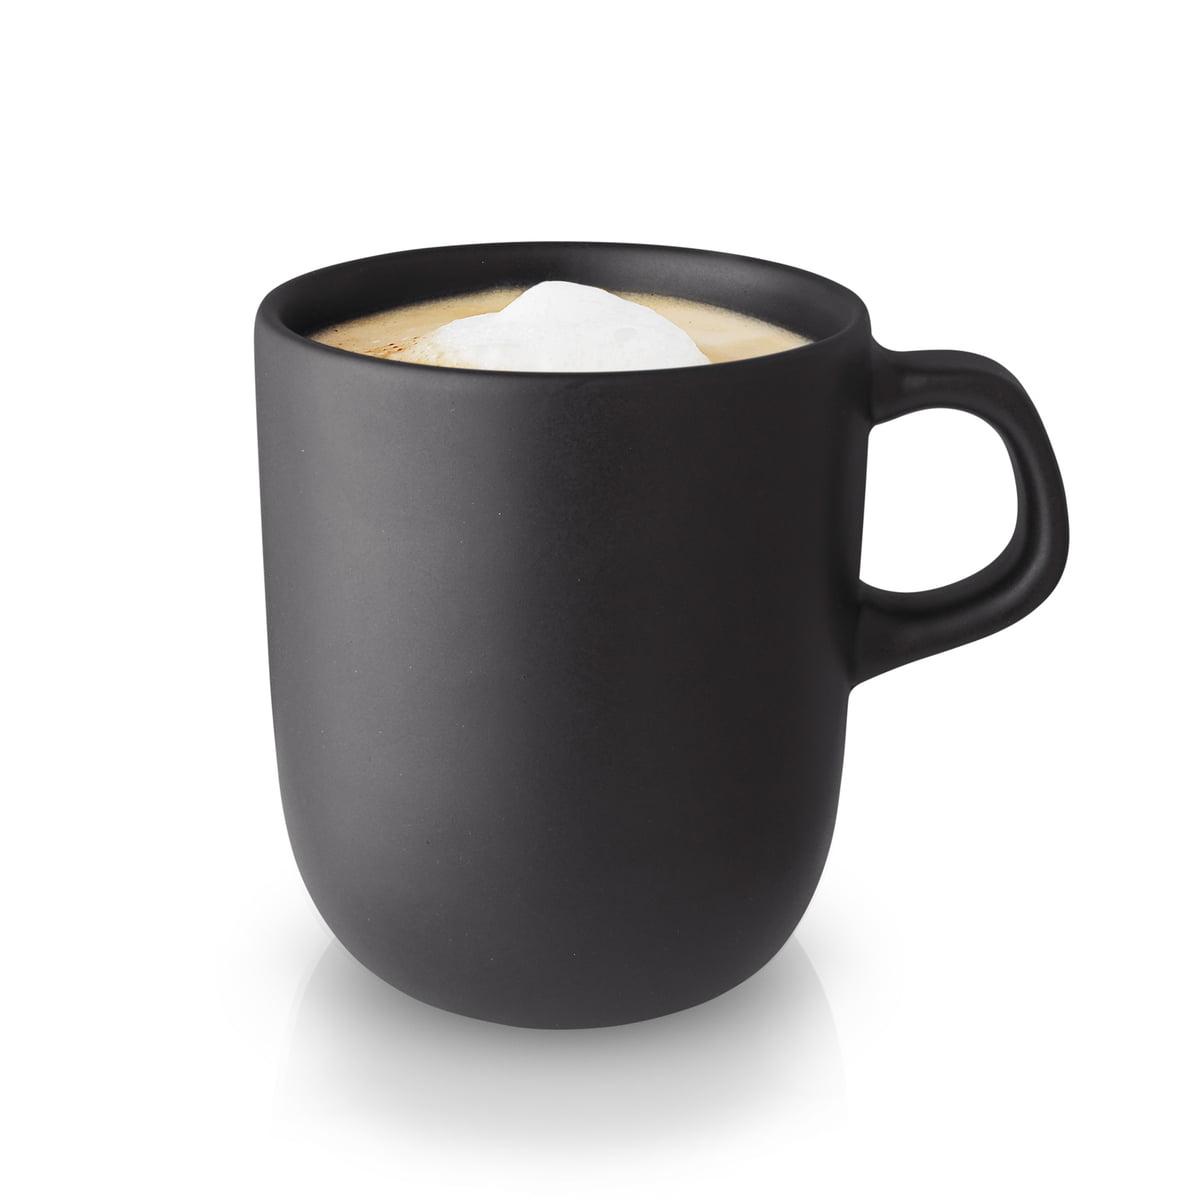 Nordic Mug by Eva Solo...